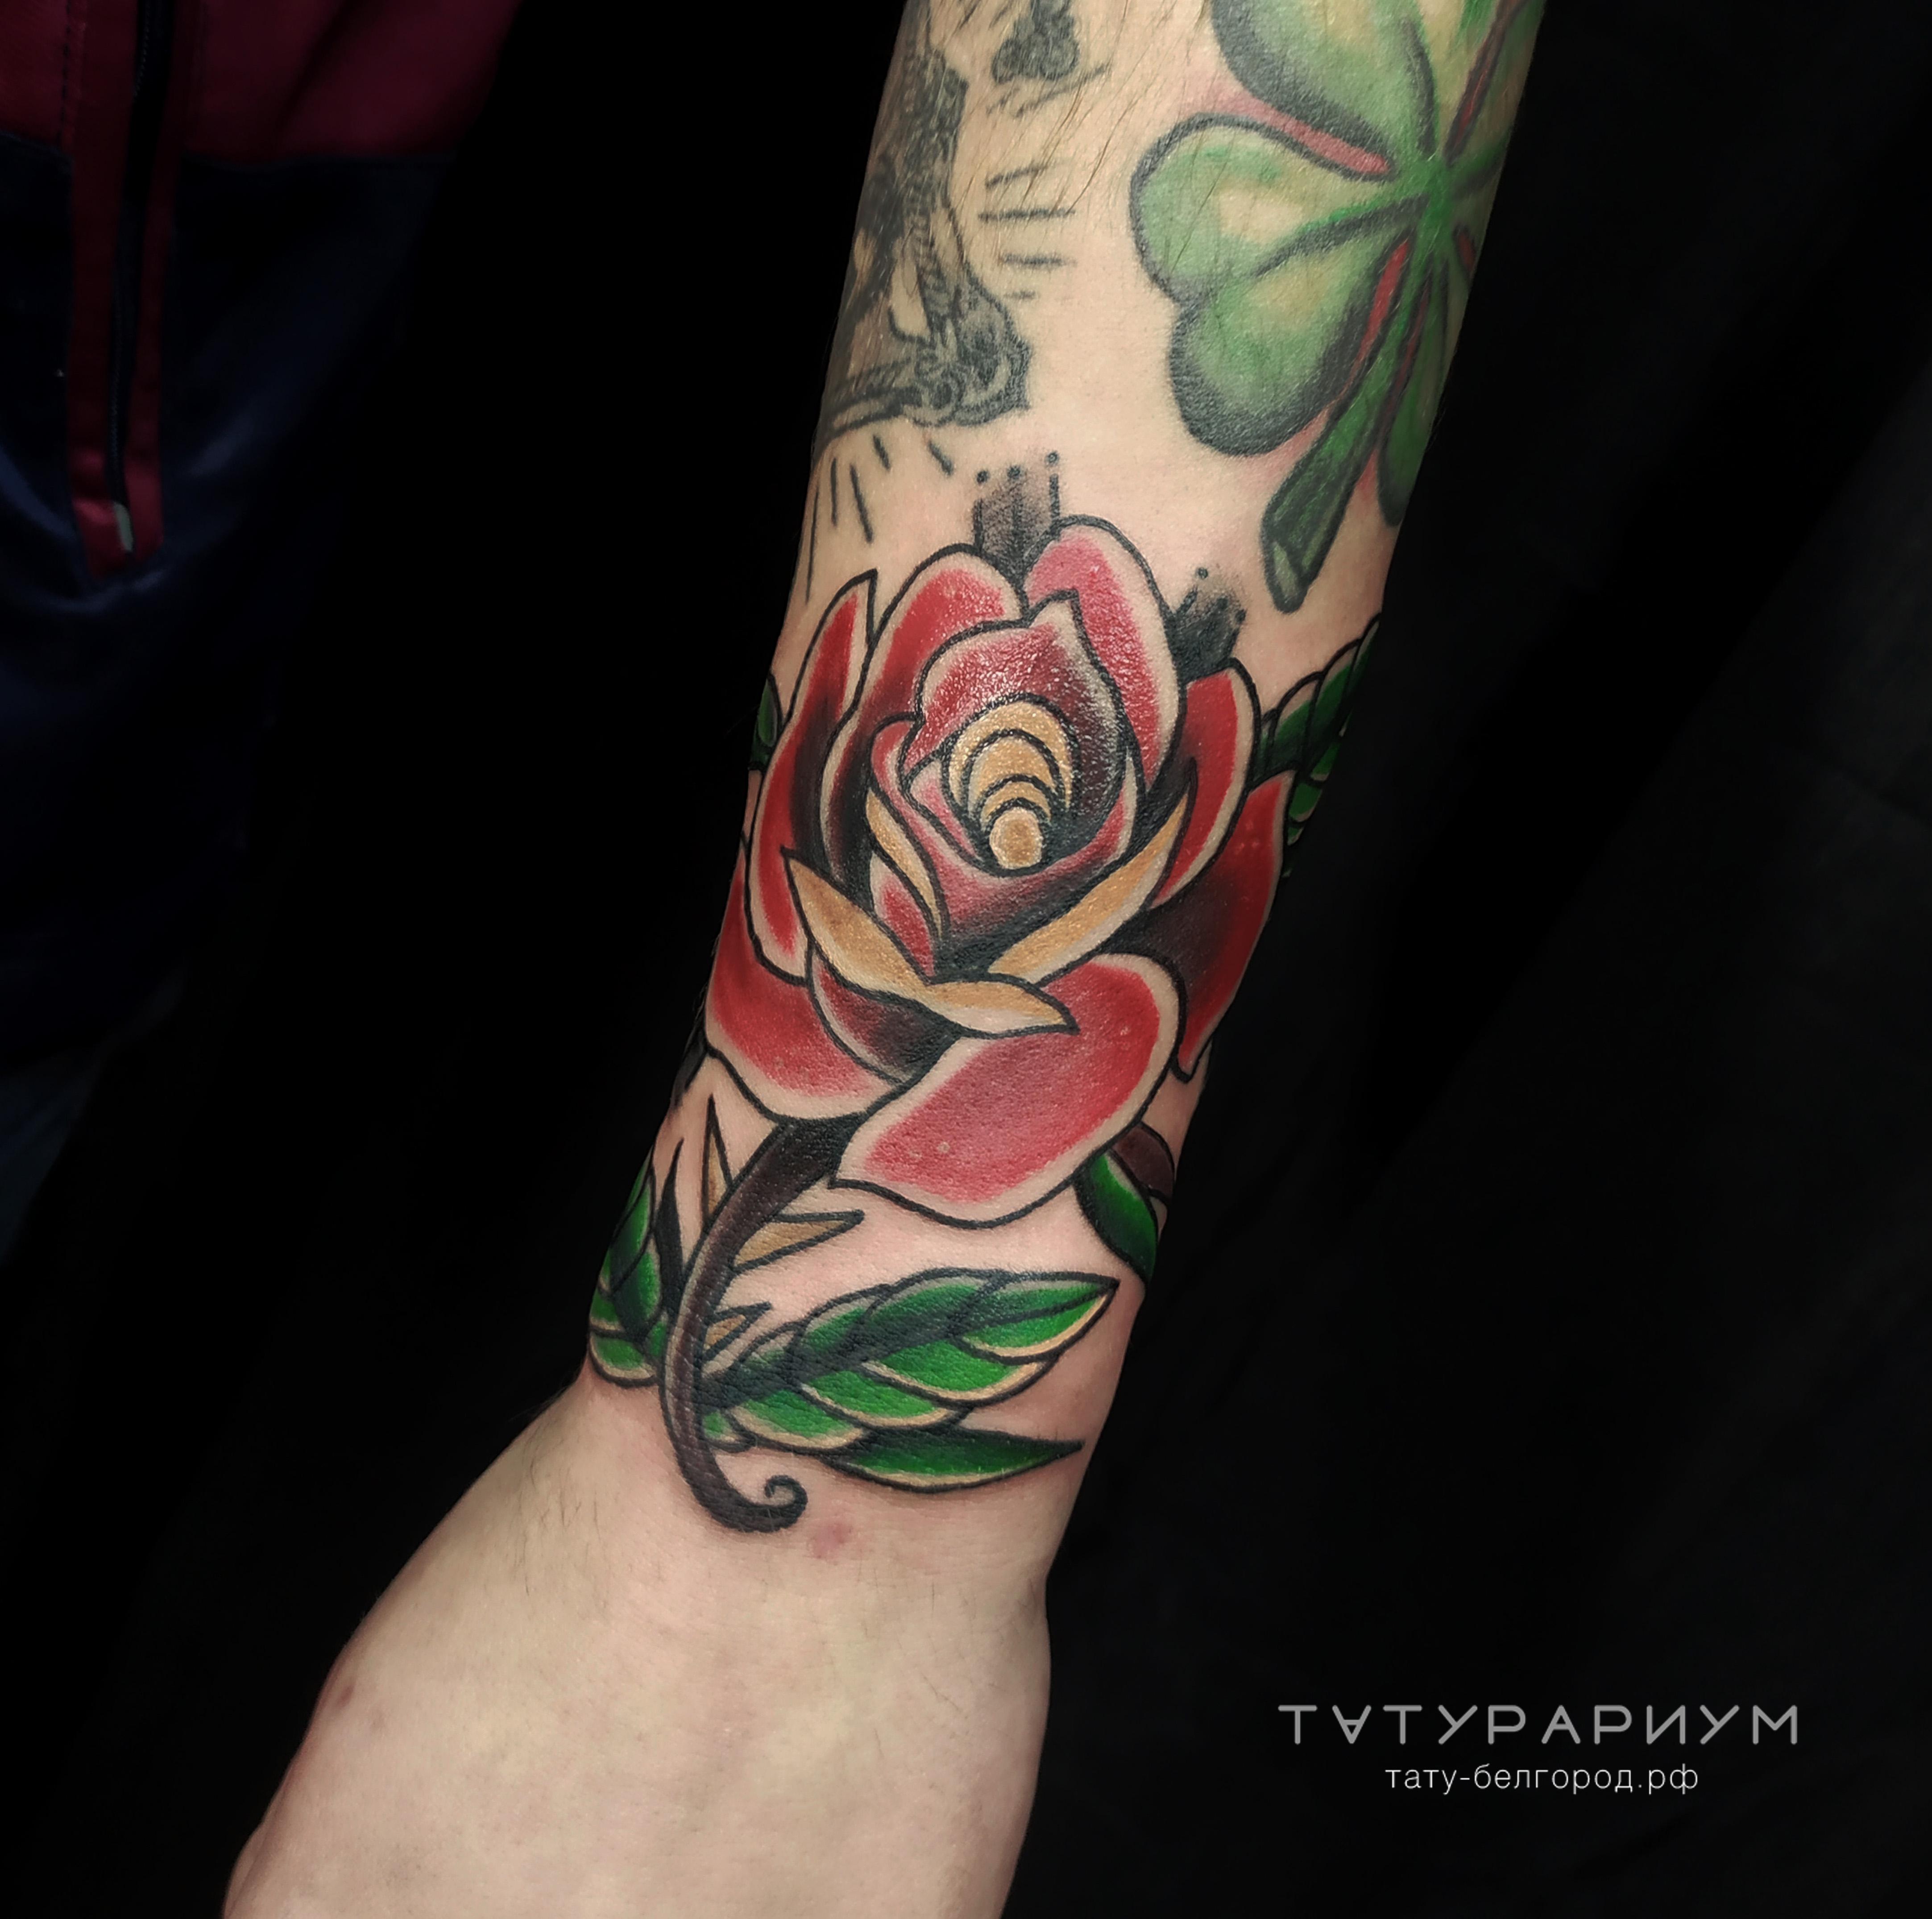 Фото татуировки цветная роза в стиле олд